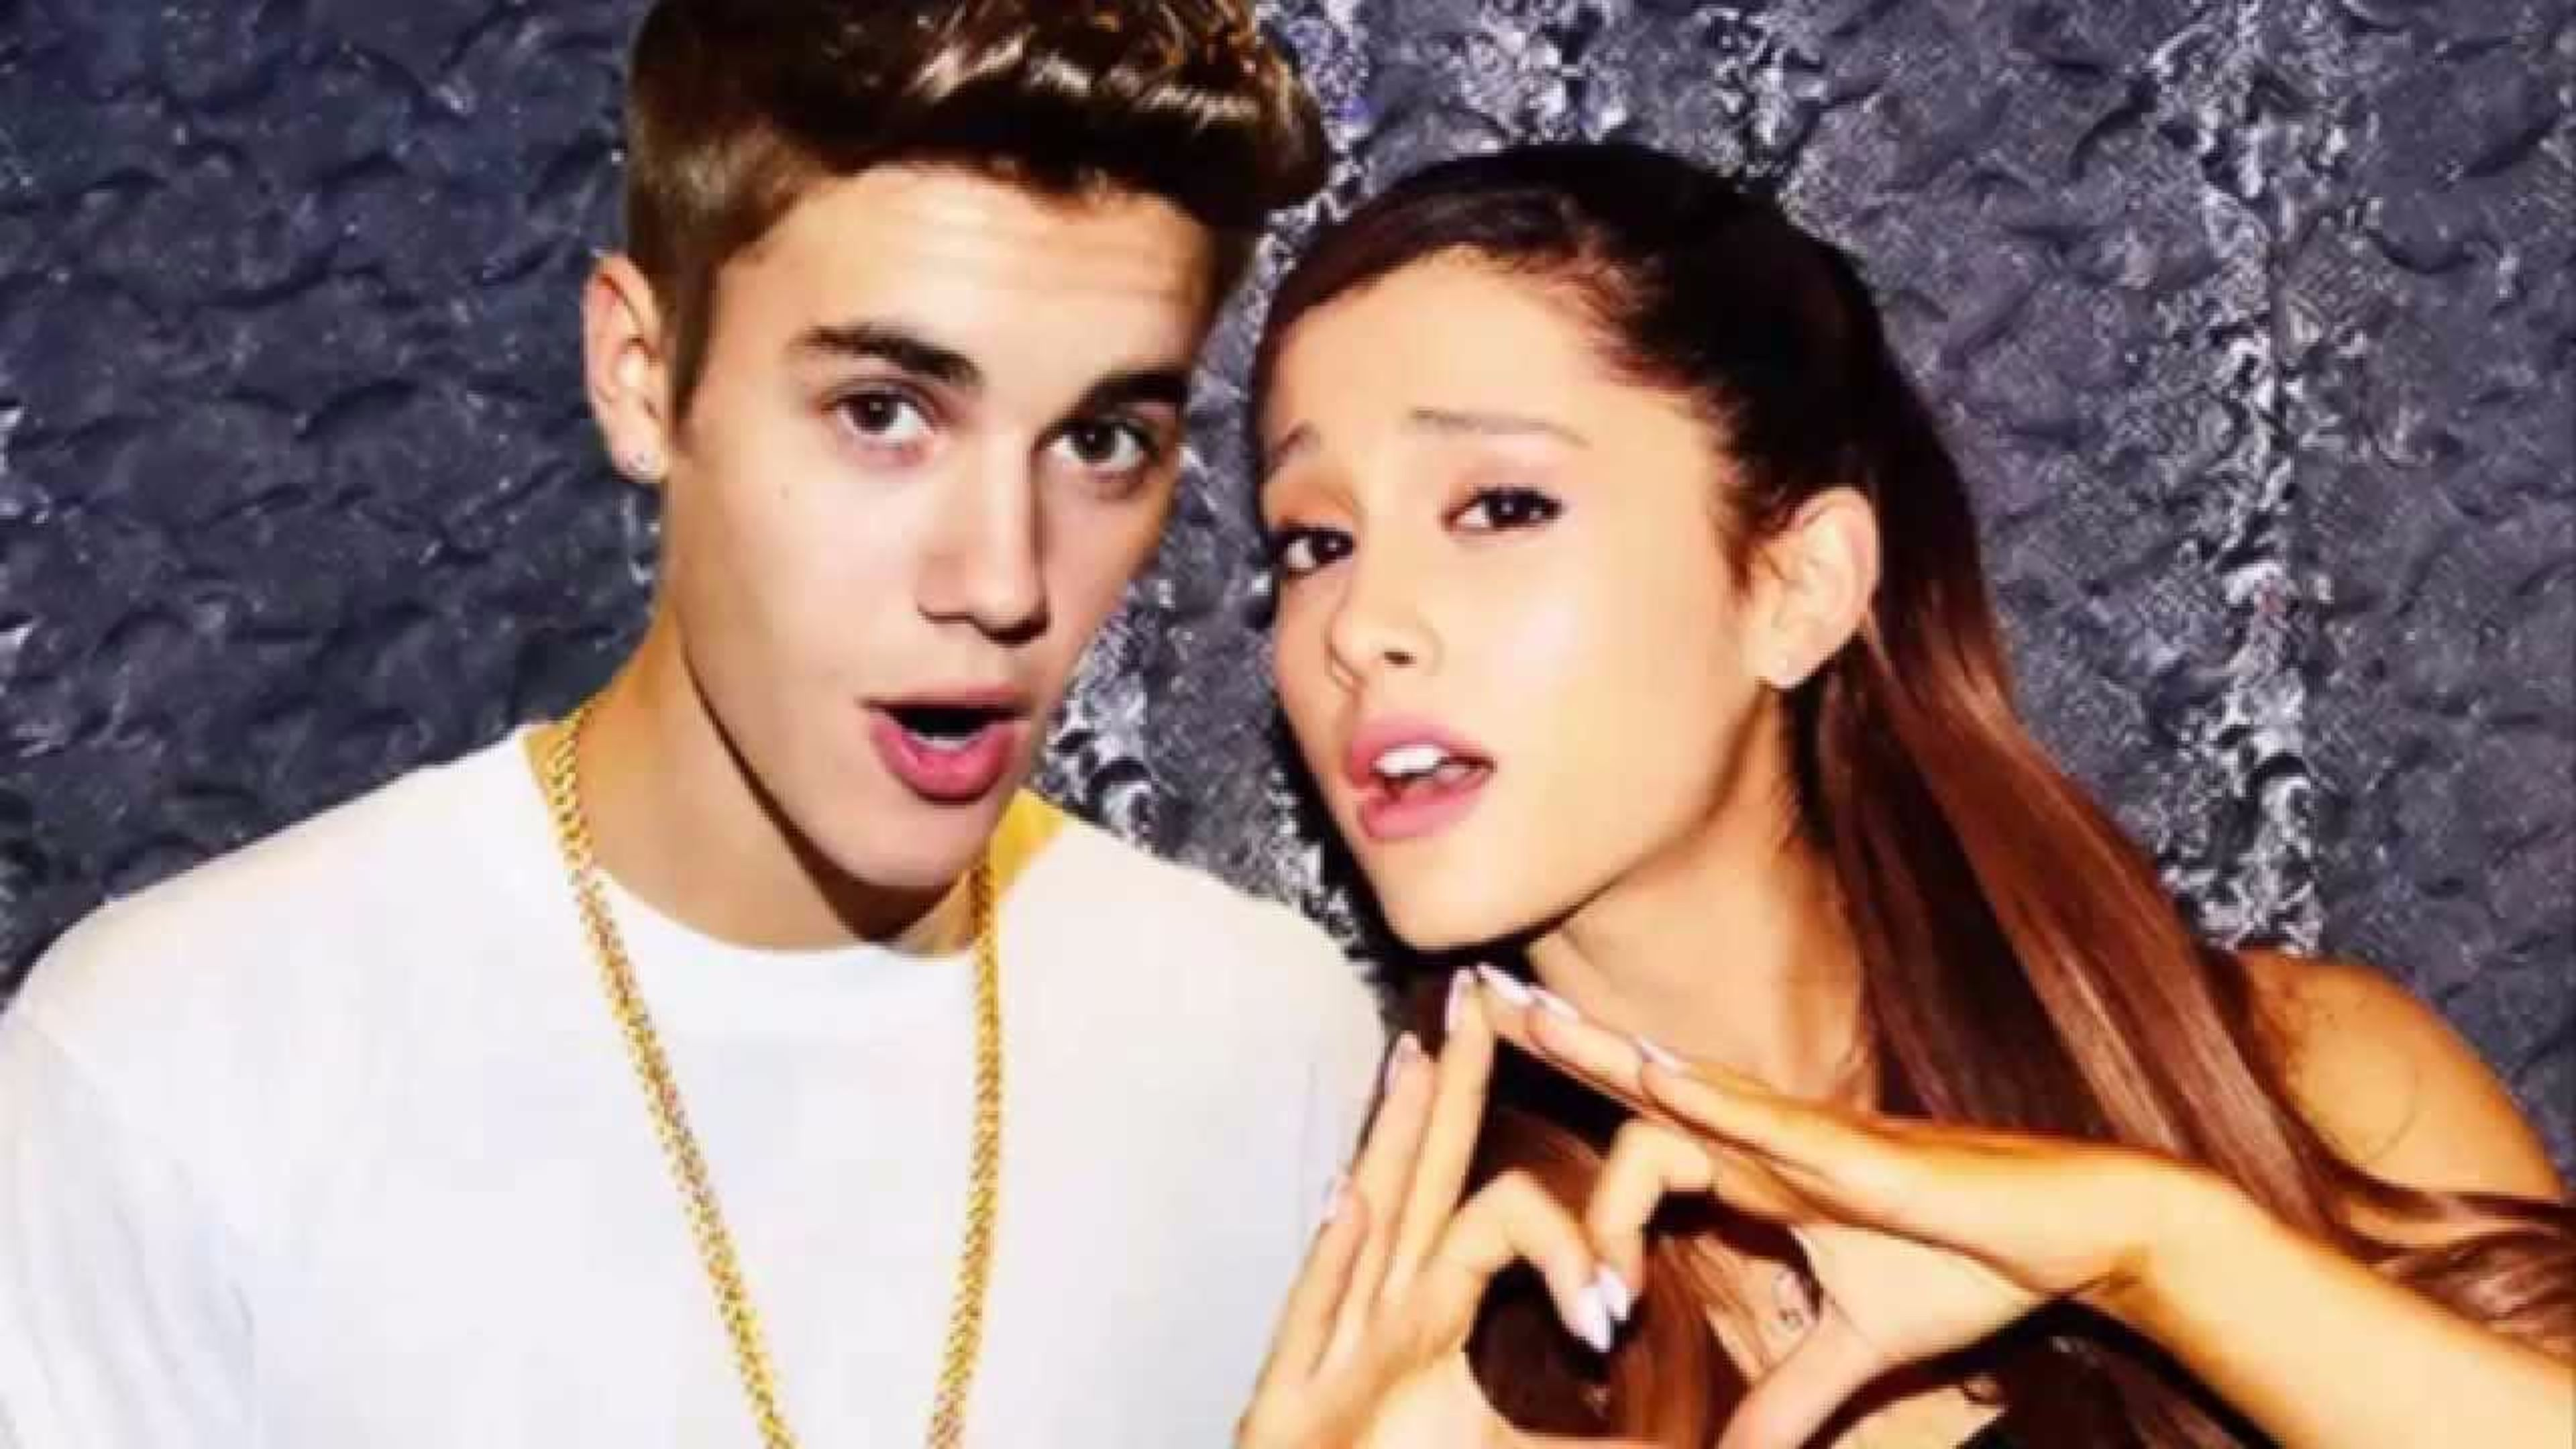 Justin Bieber and 4K Ariana Grande Wallpaper 4K 3840x2160